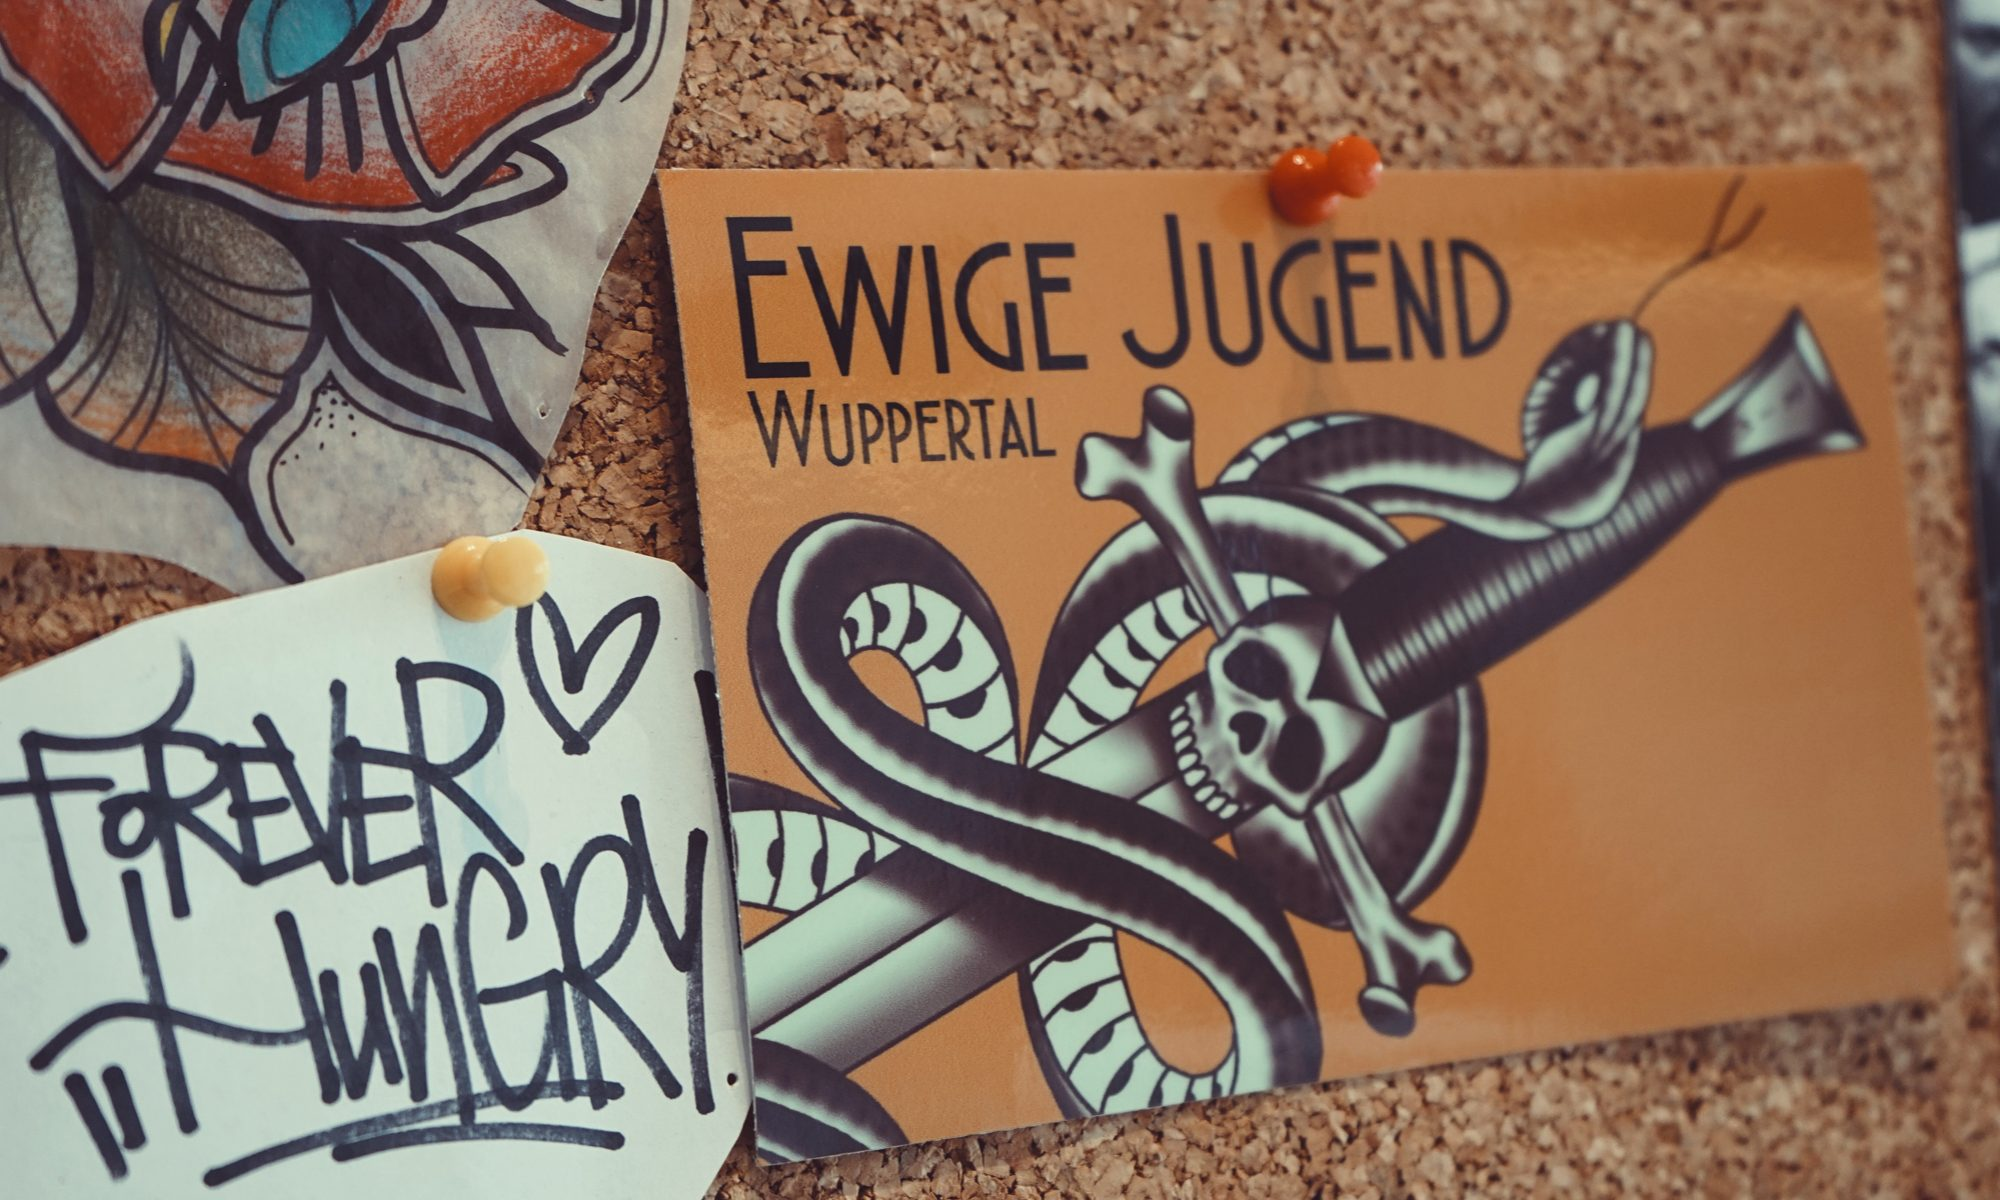 Ewige Jugend Wuppertal